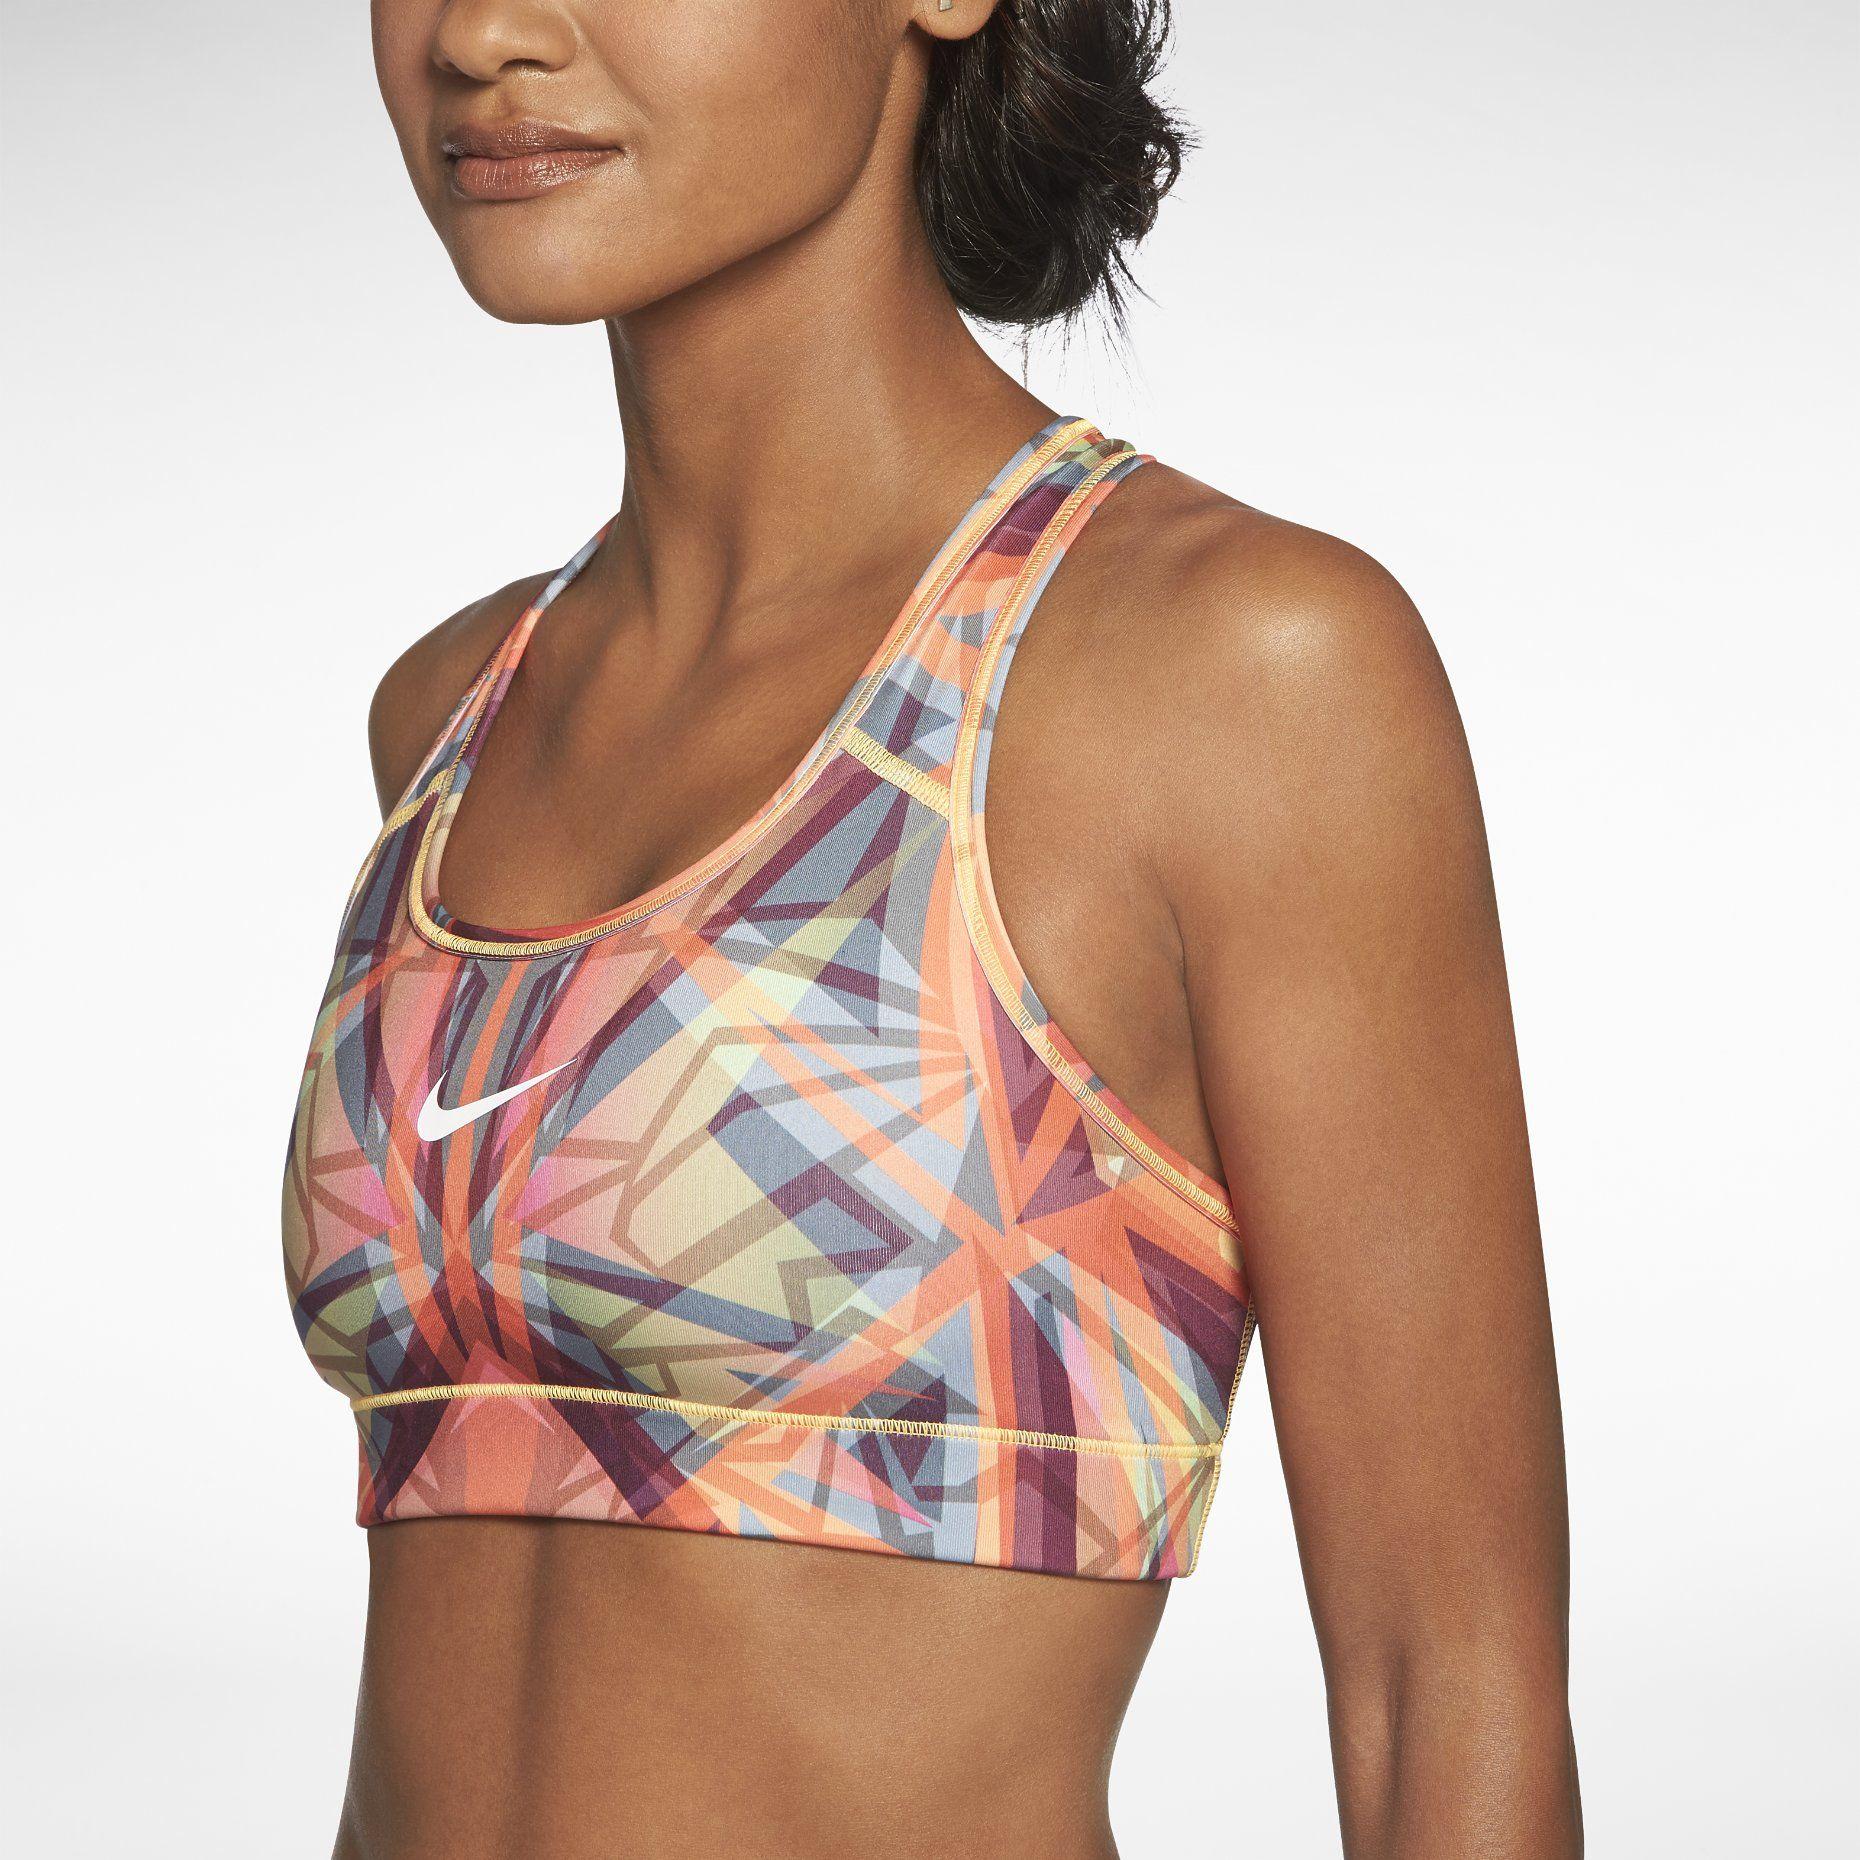 b0261dbb7f Nike Pro Hypercool Compression Kaleidoscope Women's Sports Bra ...